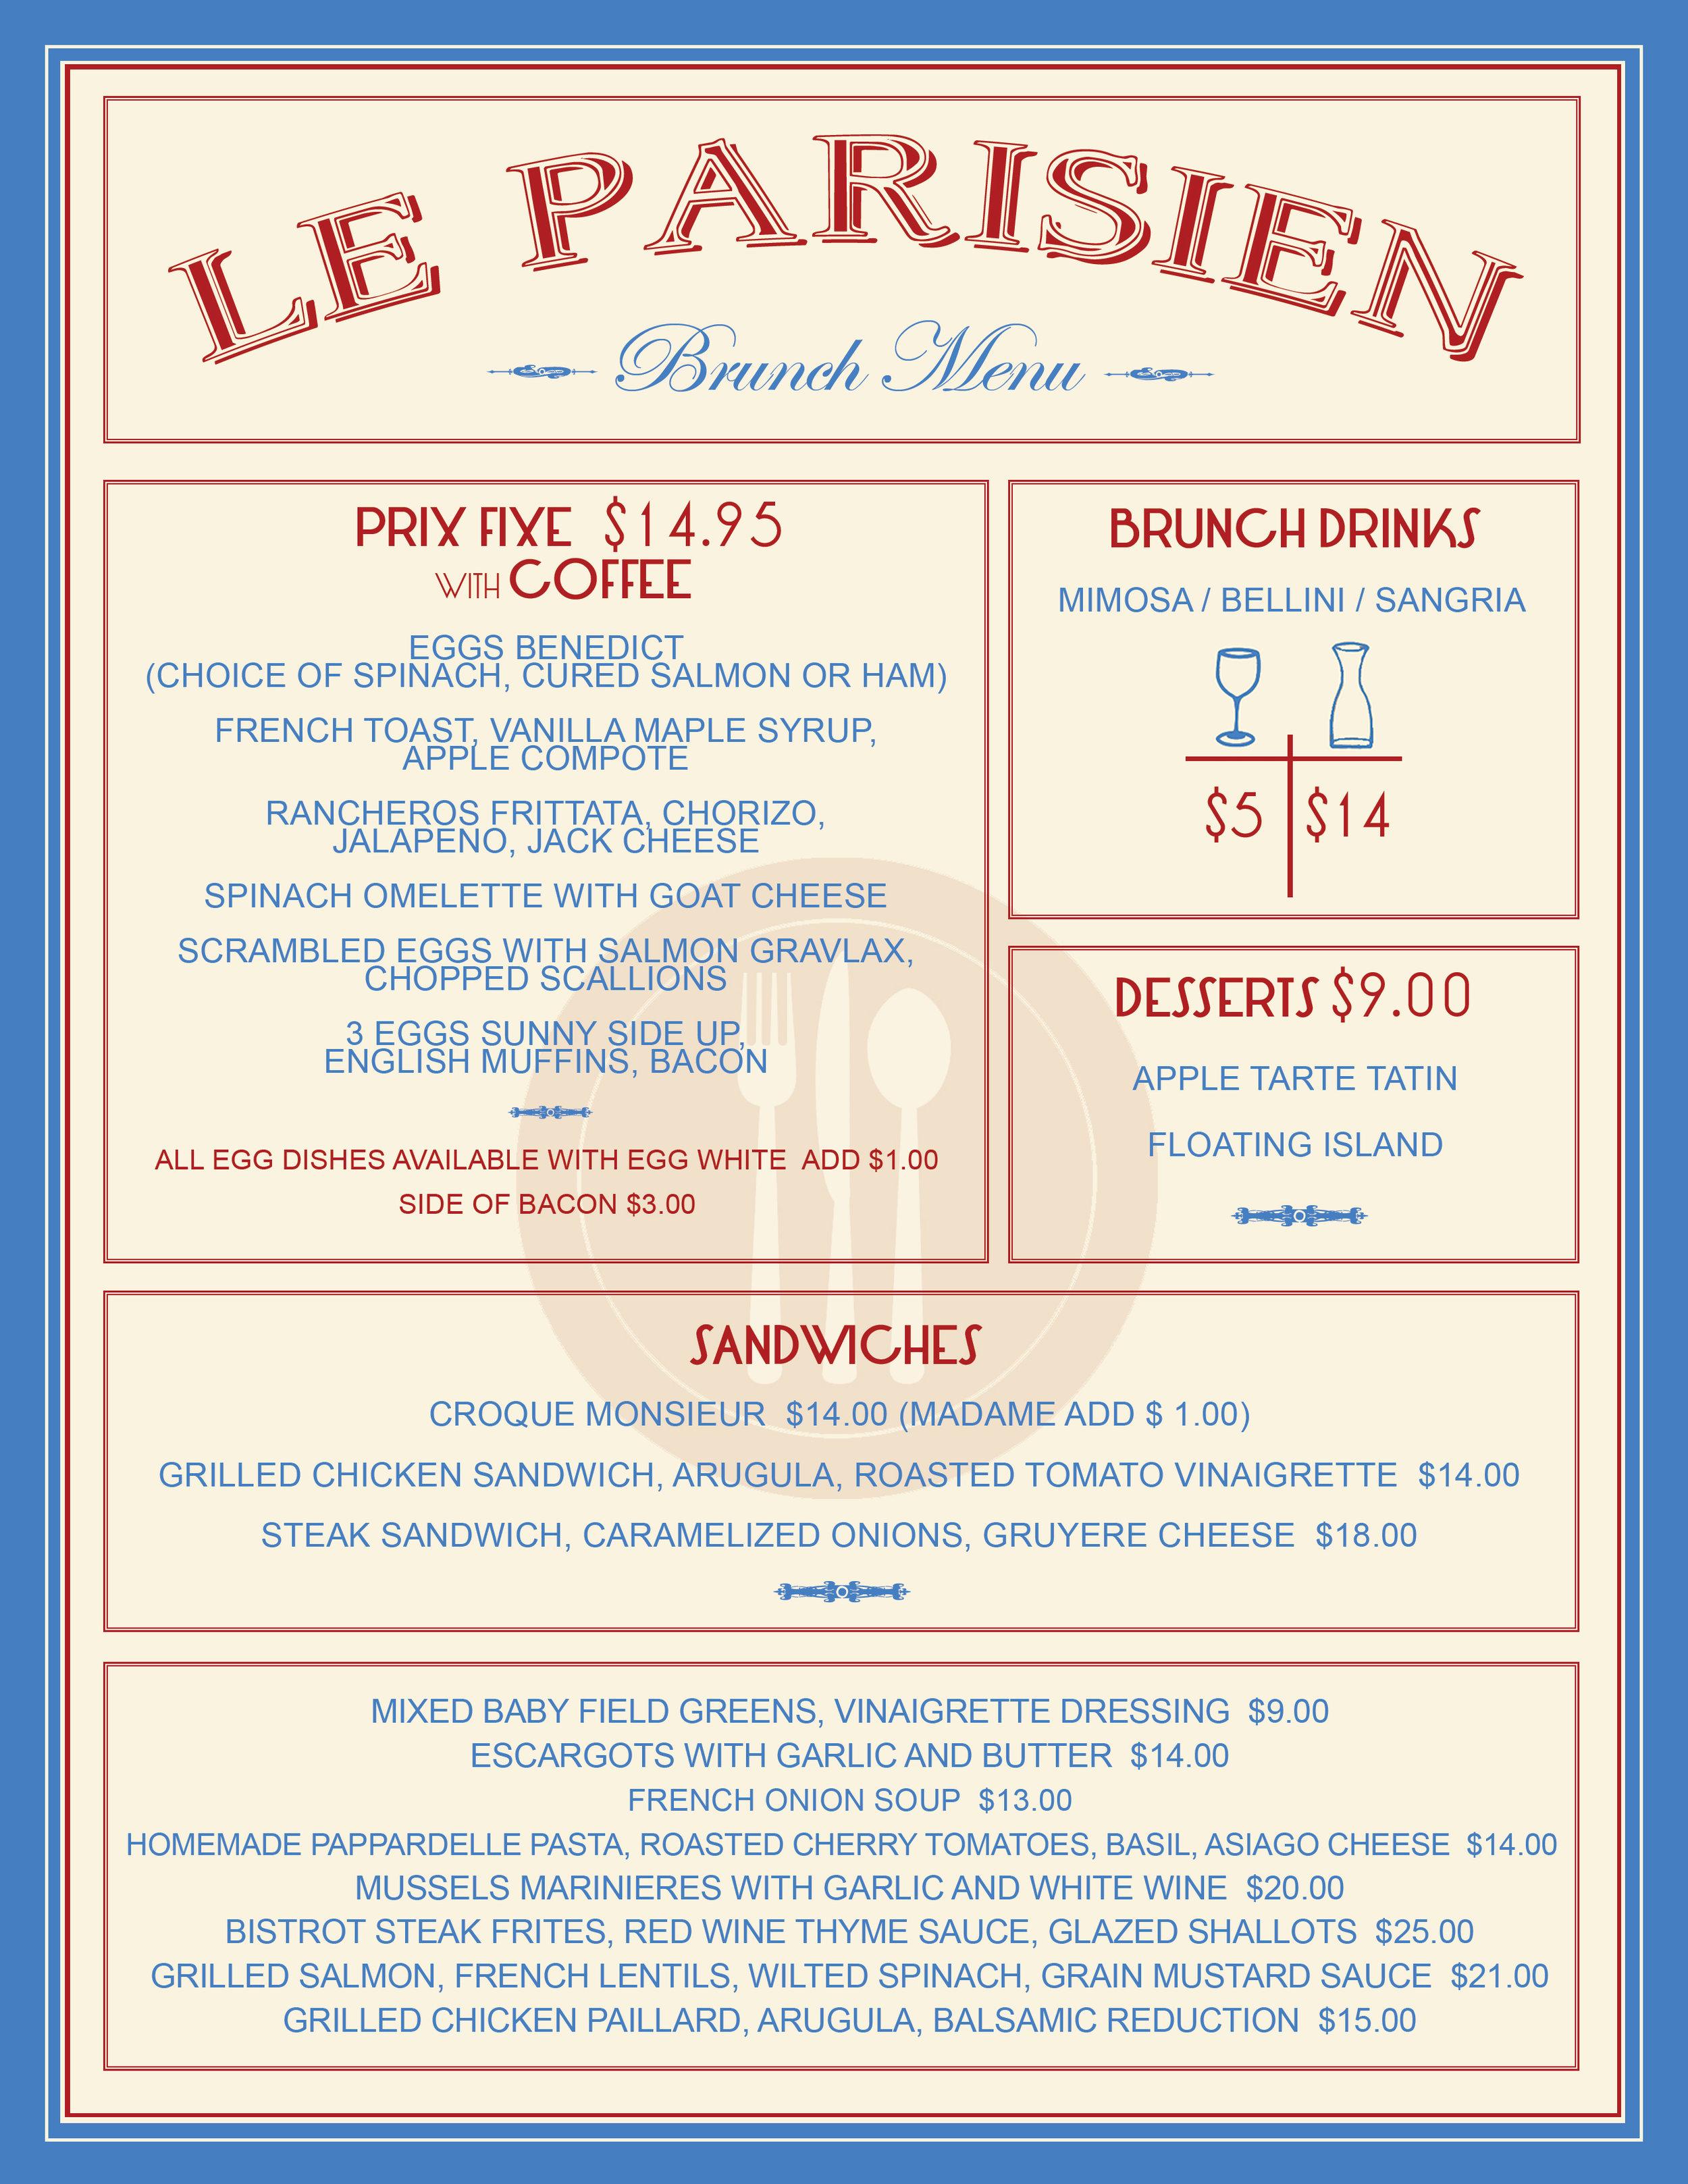 Brunch menu layout and design for Le Parisien Bistrot.